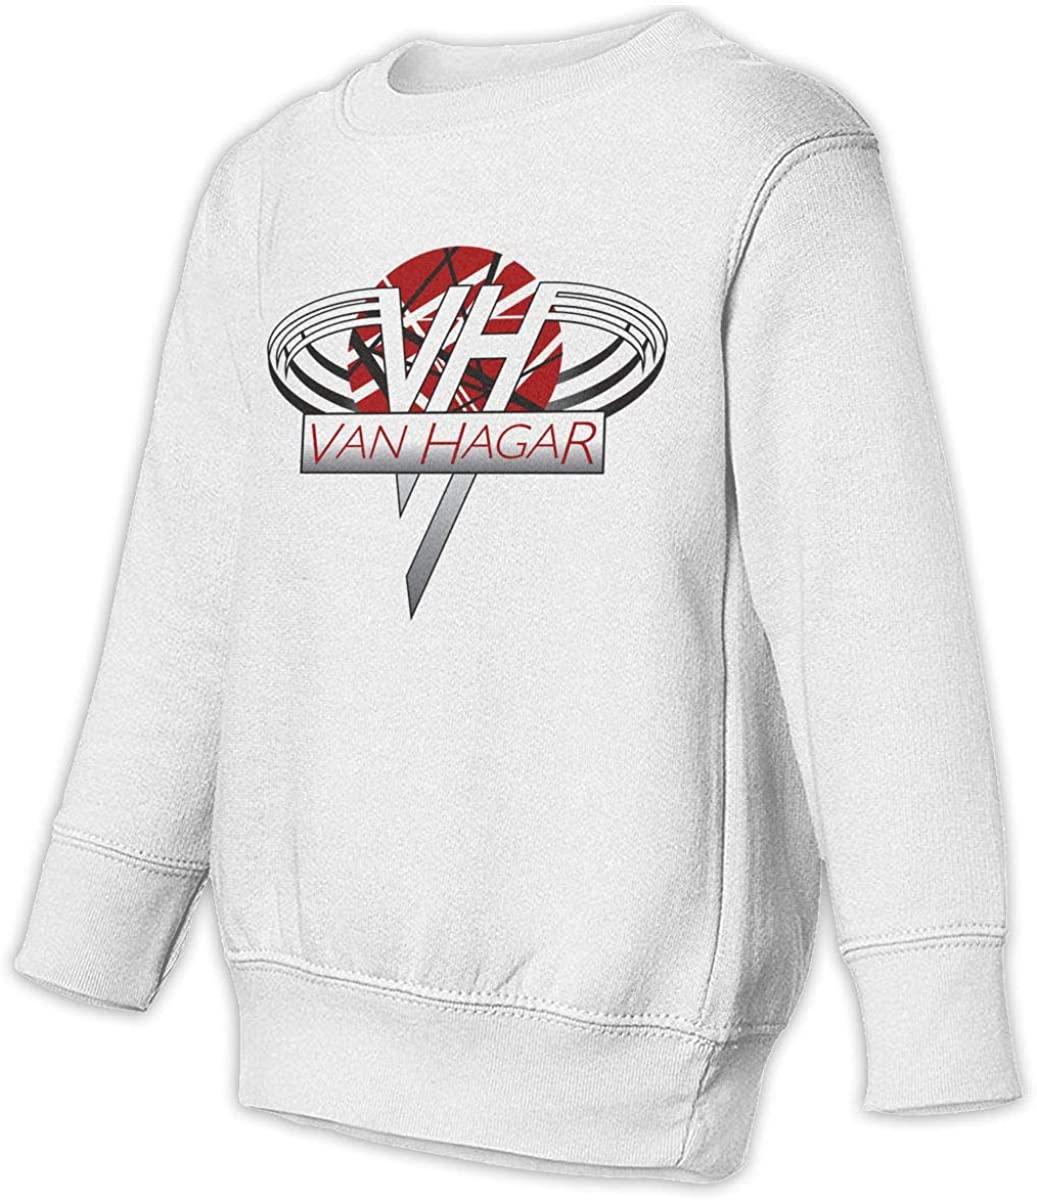 ASDFNLSF Van Halen 1984 Unisex Sweatshirt Youth Boy and Girls Pullover Sweatshirt